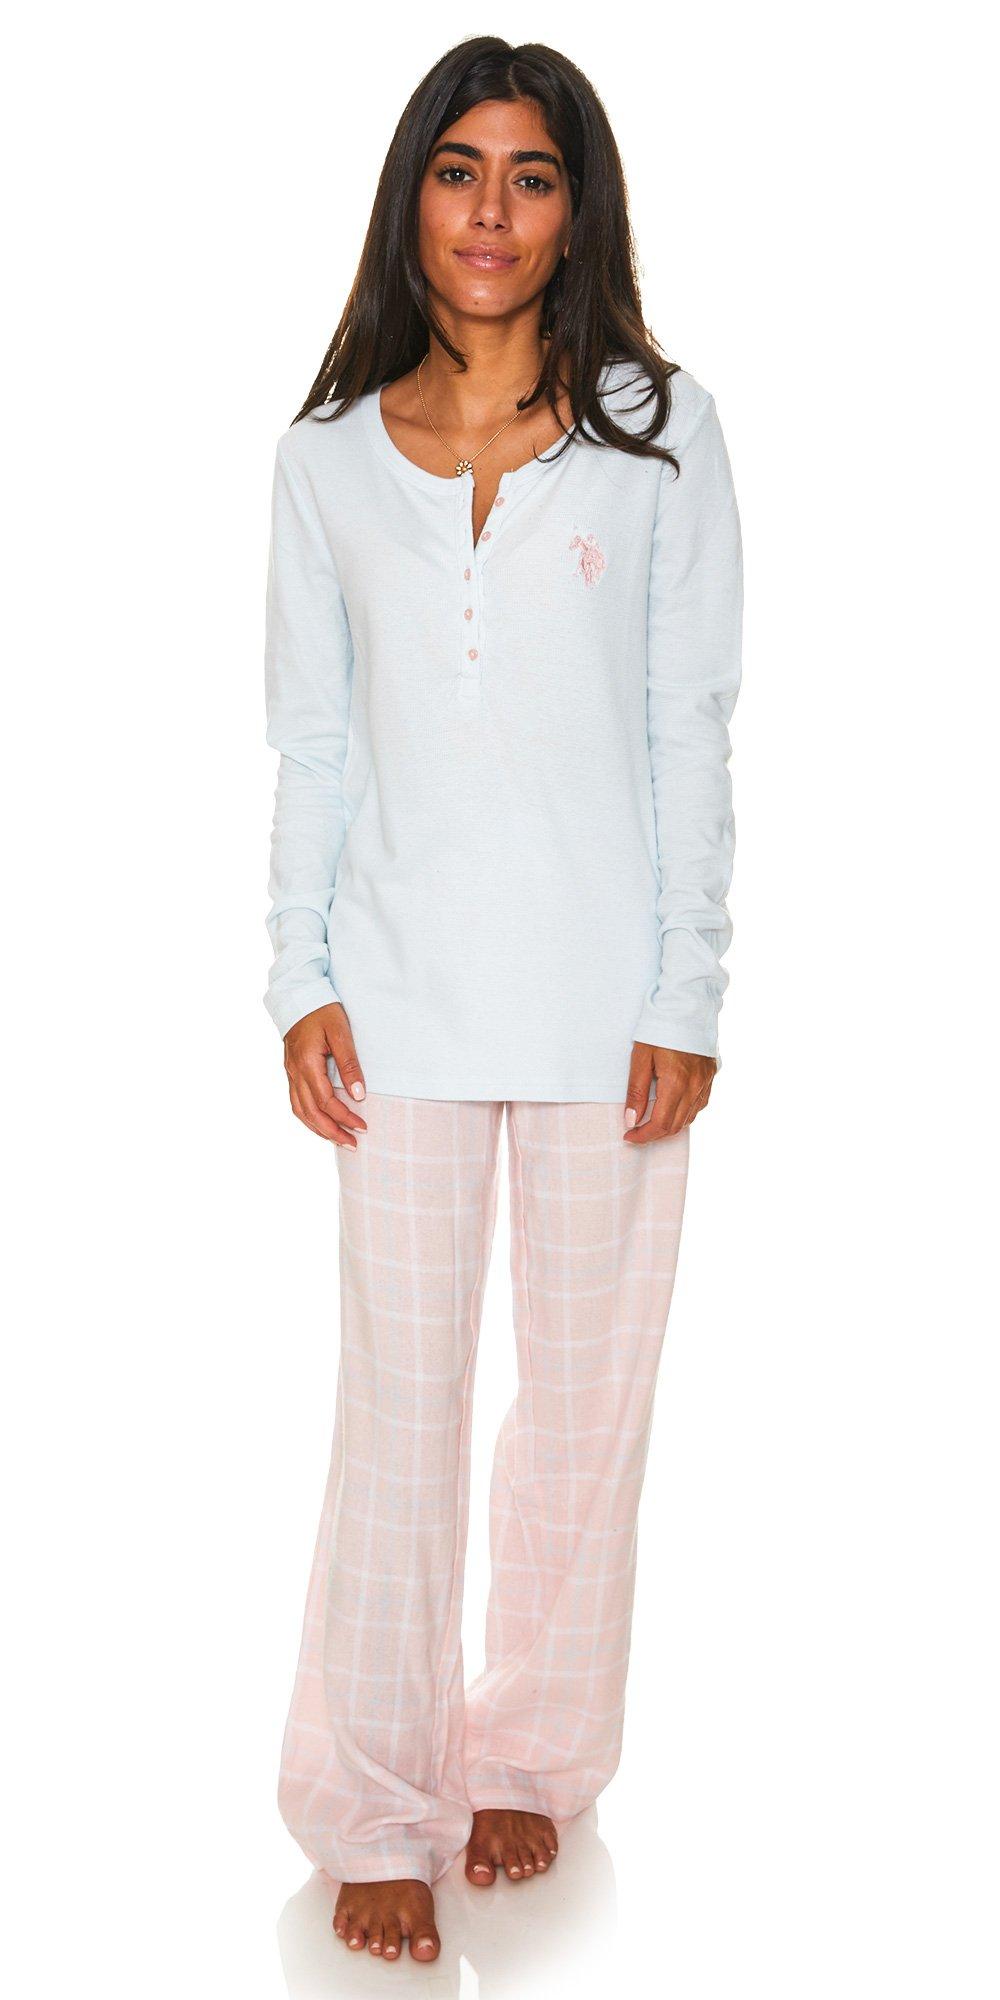 U.S. Polo Assn. Womens Thermal Top and Cotton Pants Flannel Pajamas Sleep Set Light Blue Large